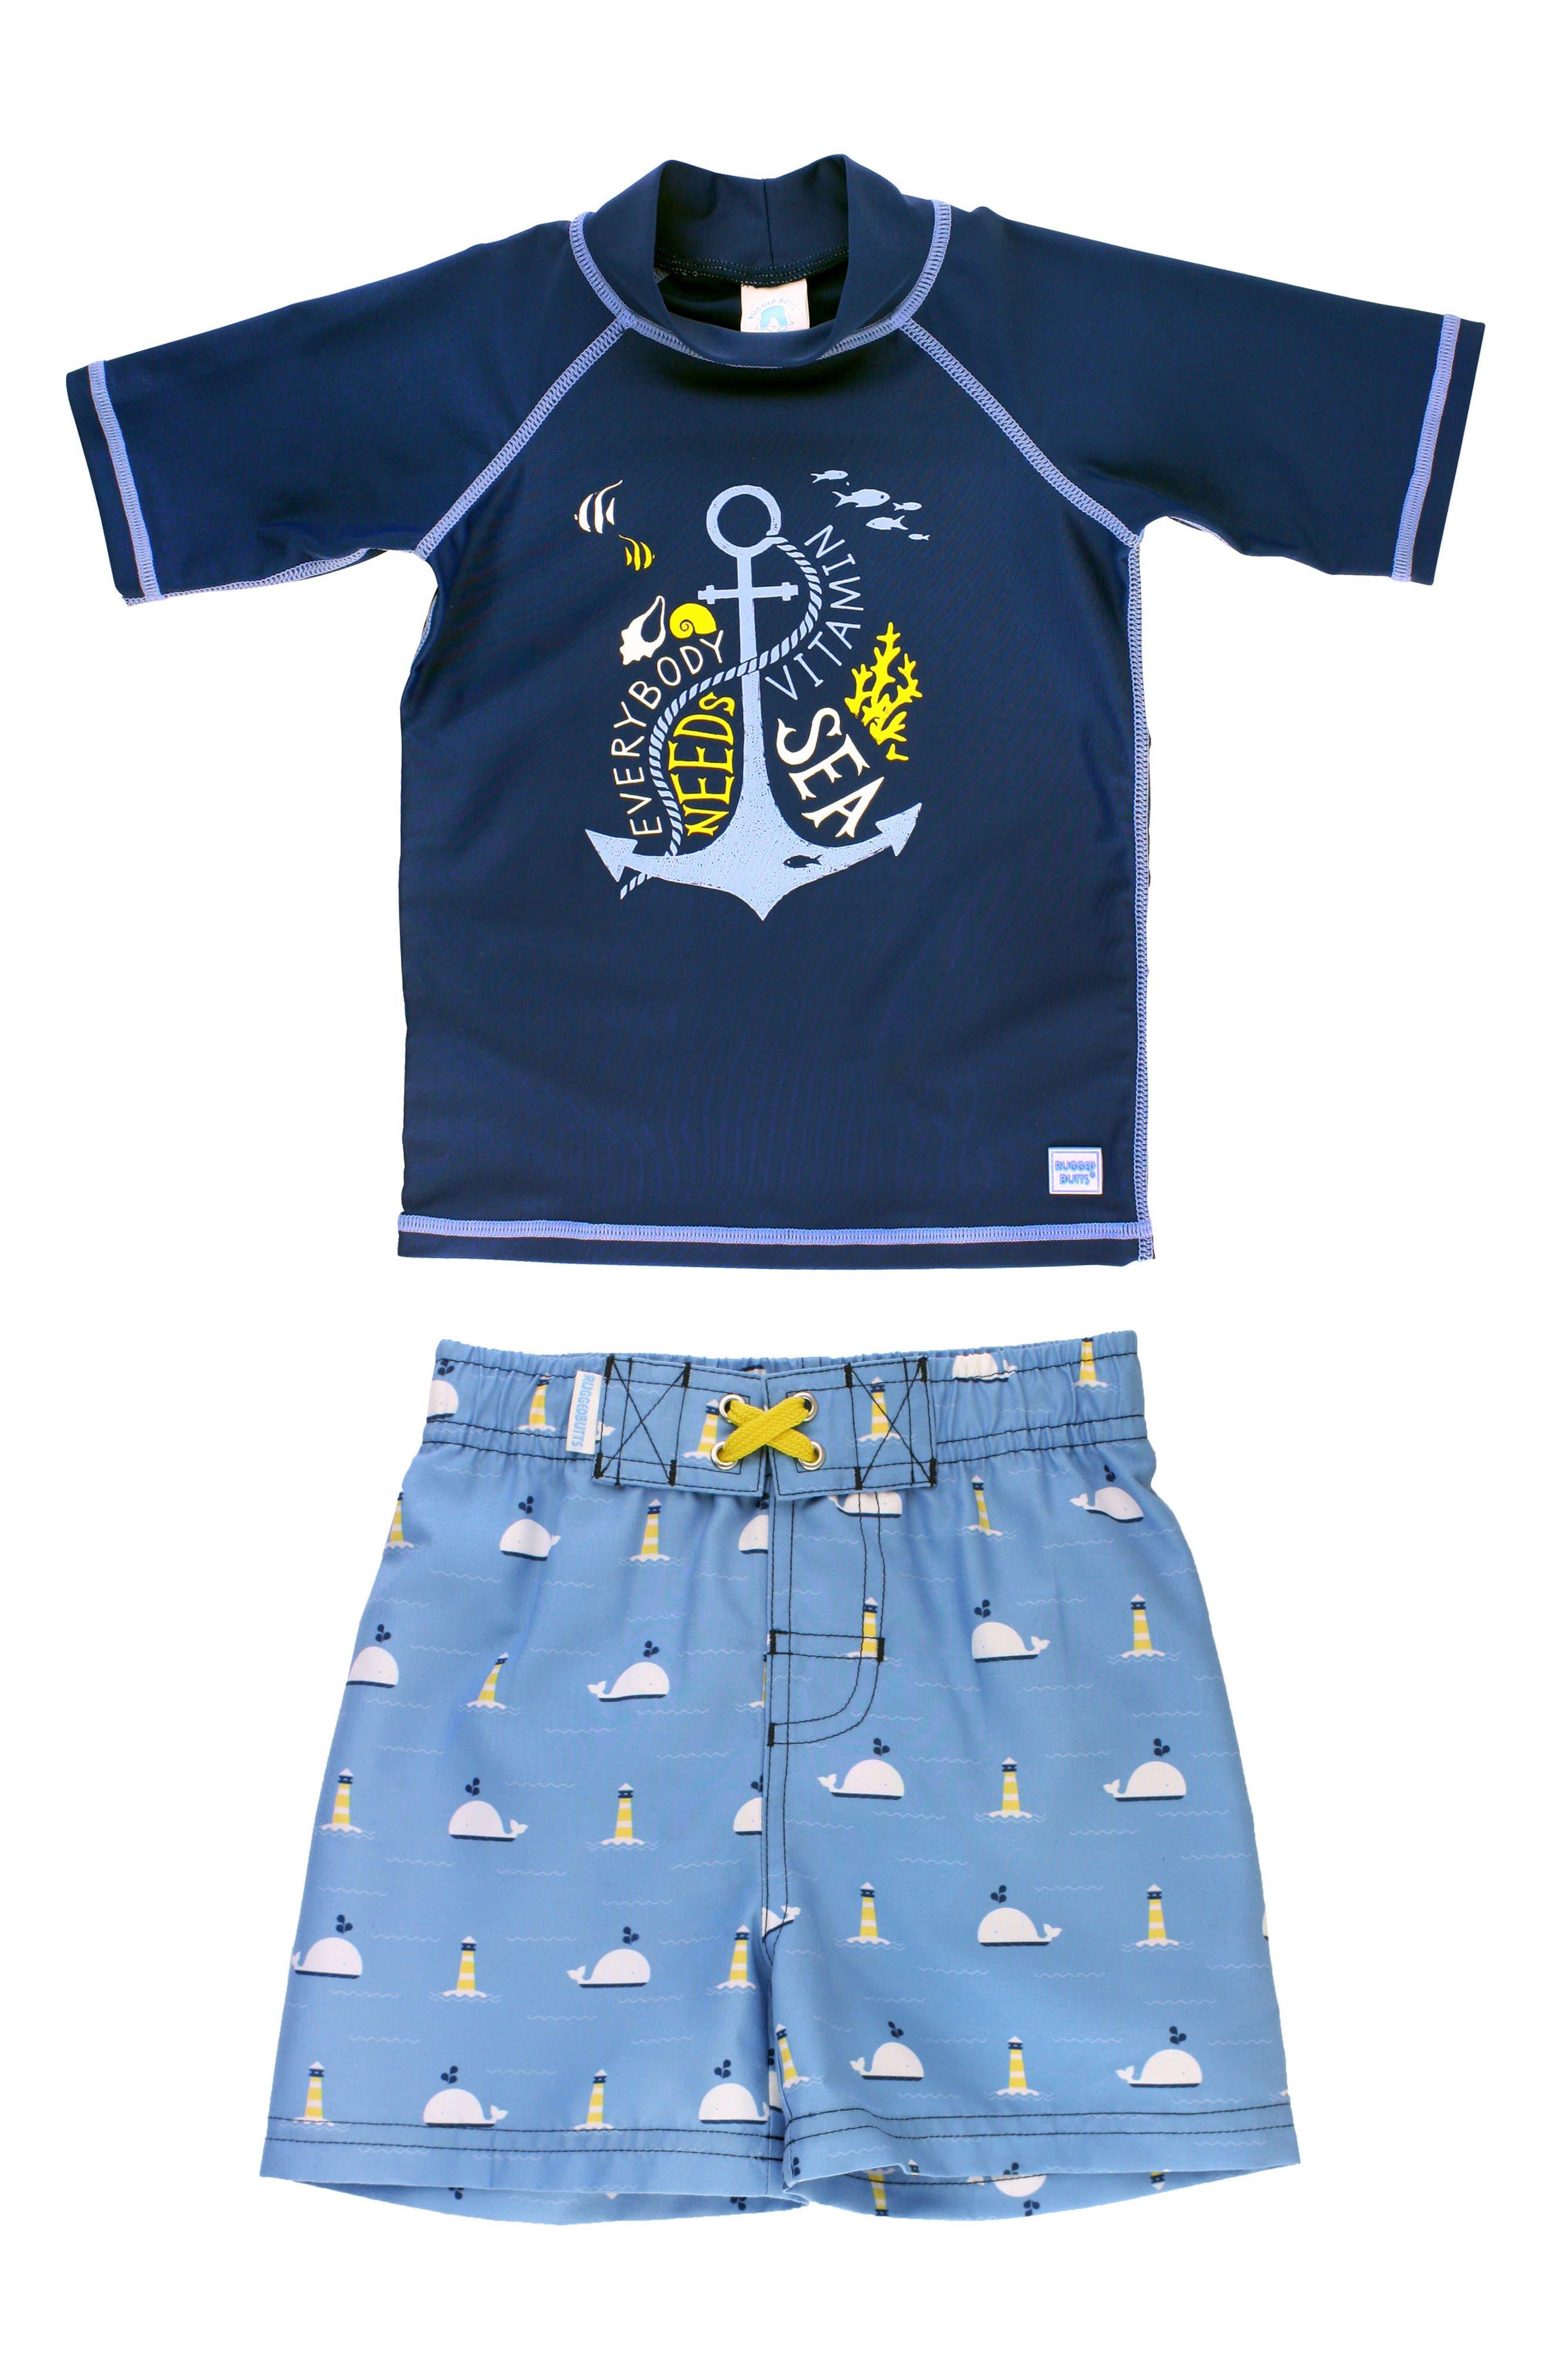 Main Image - RuggedButts Vitamin Sea Two-Piece Rashguard Swimsuit (Baby Boys)